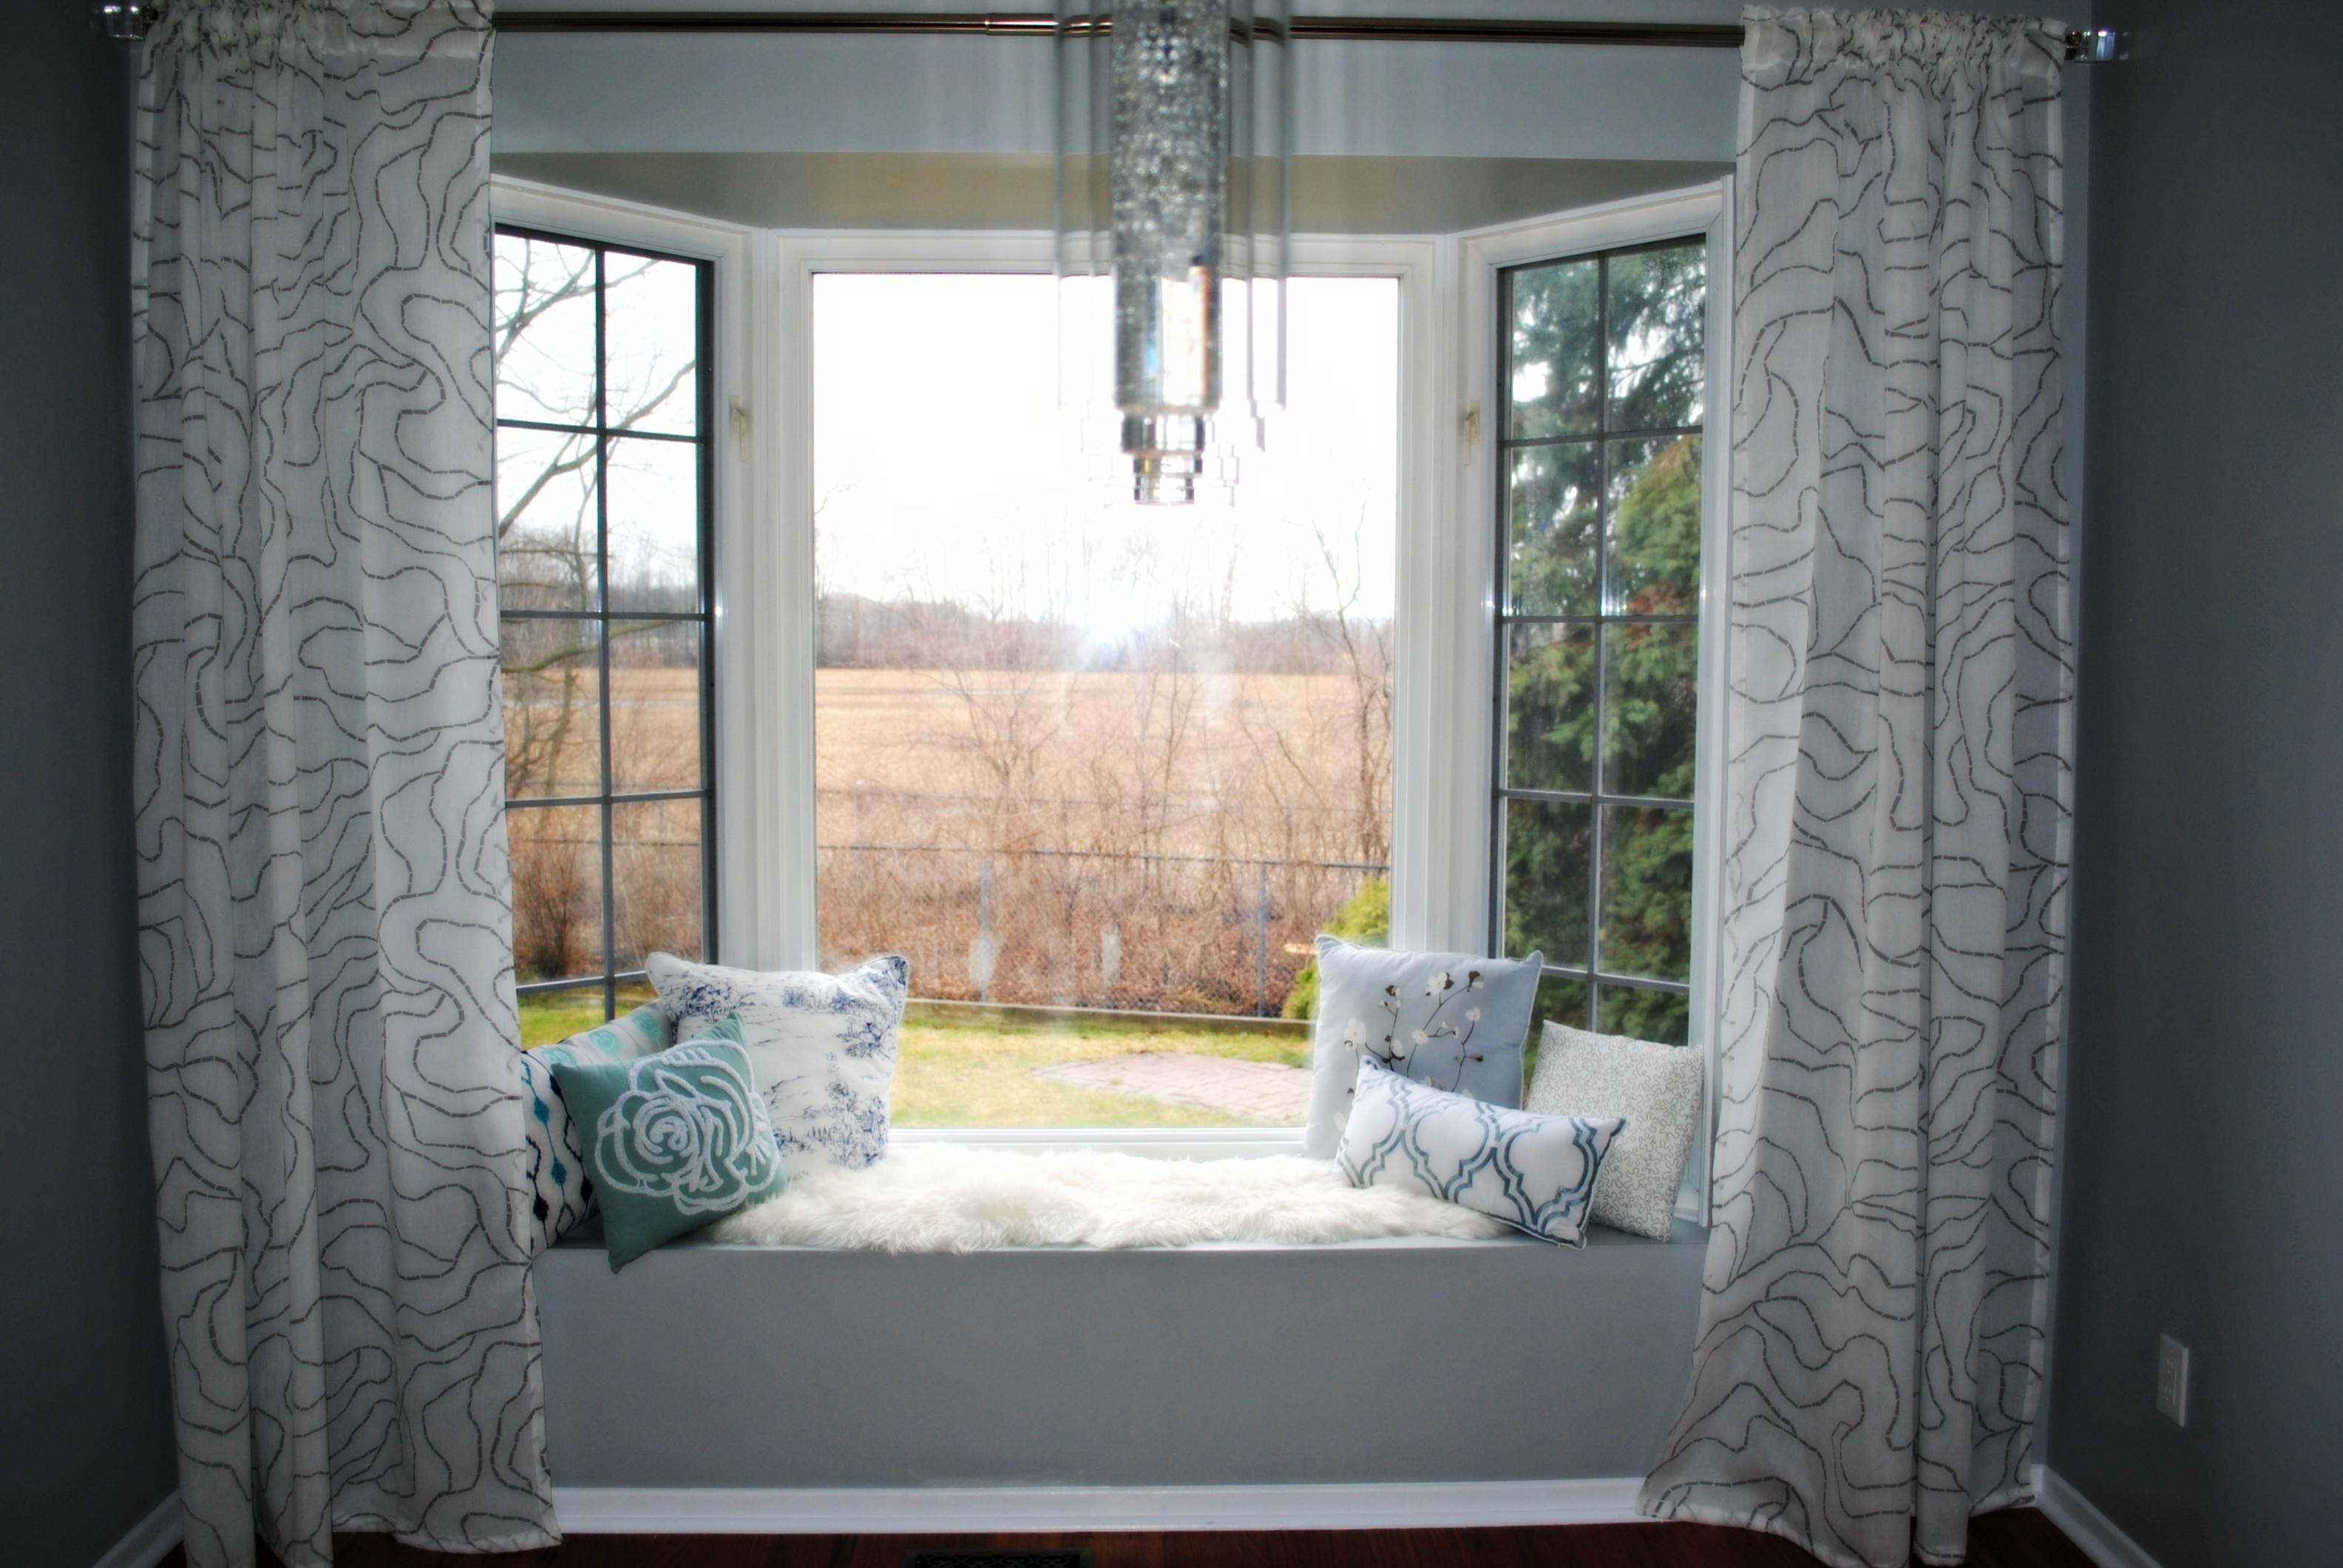 bay window window treatment ideas inspirational living room beautiful window treatment ideas for living of bay window window treatment ideas